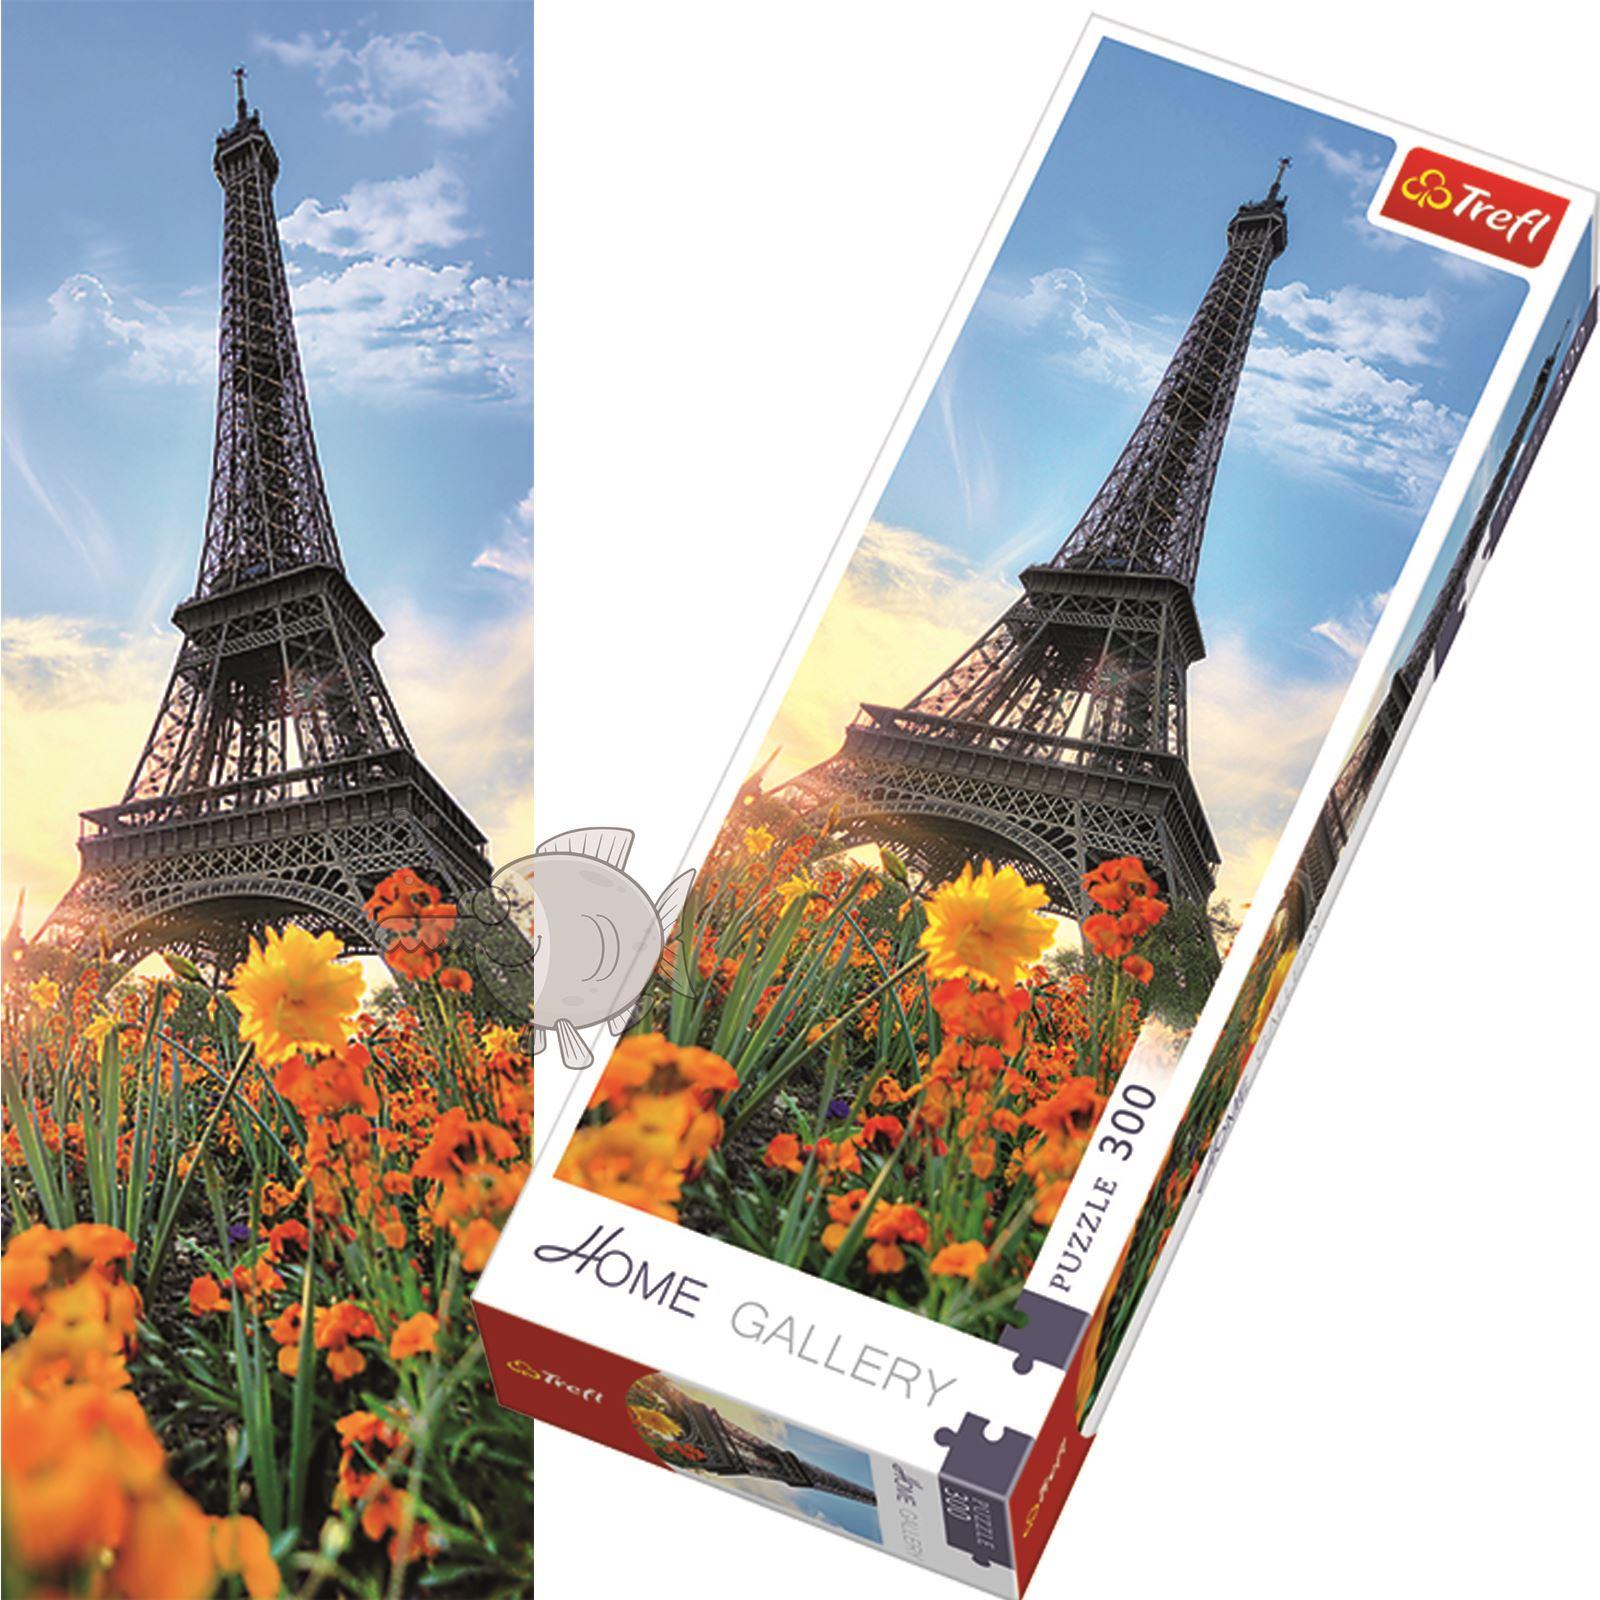 Trefl-300-500-1000-1500-2000-3000-4000-6000-Piece-Jigsaw-Puzzle-Landscapes-City thumbnail 384